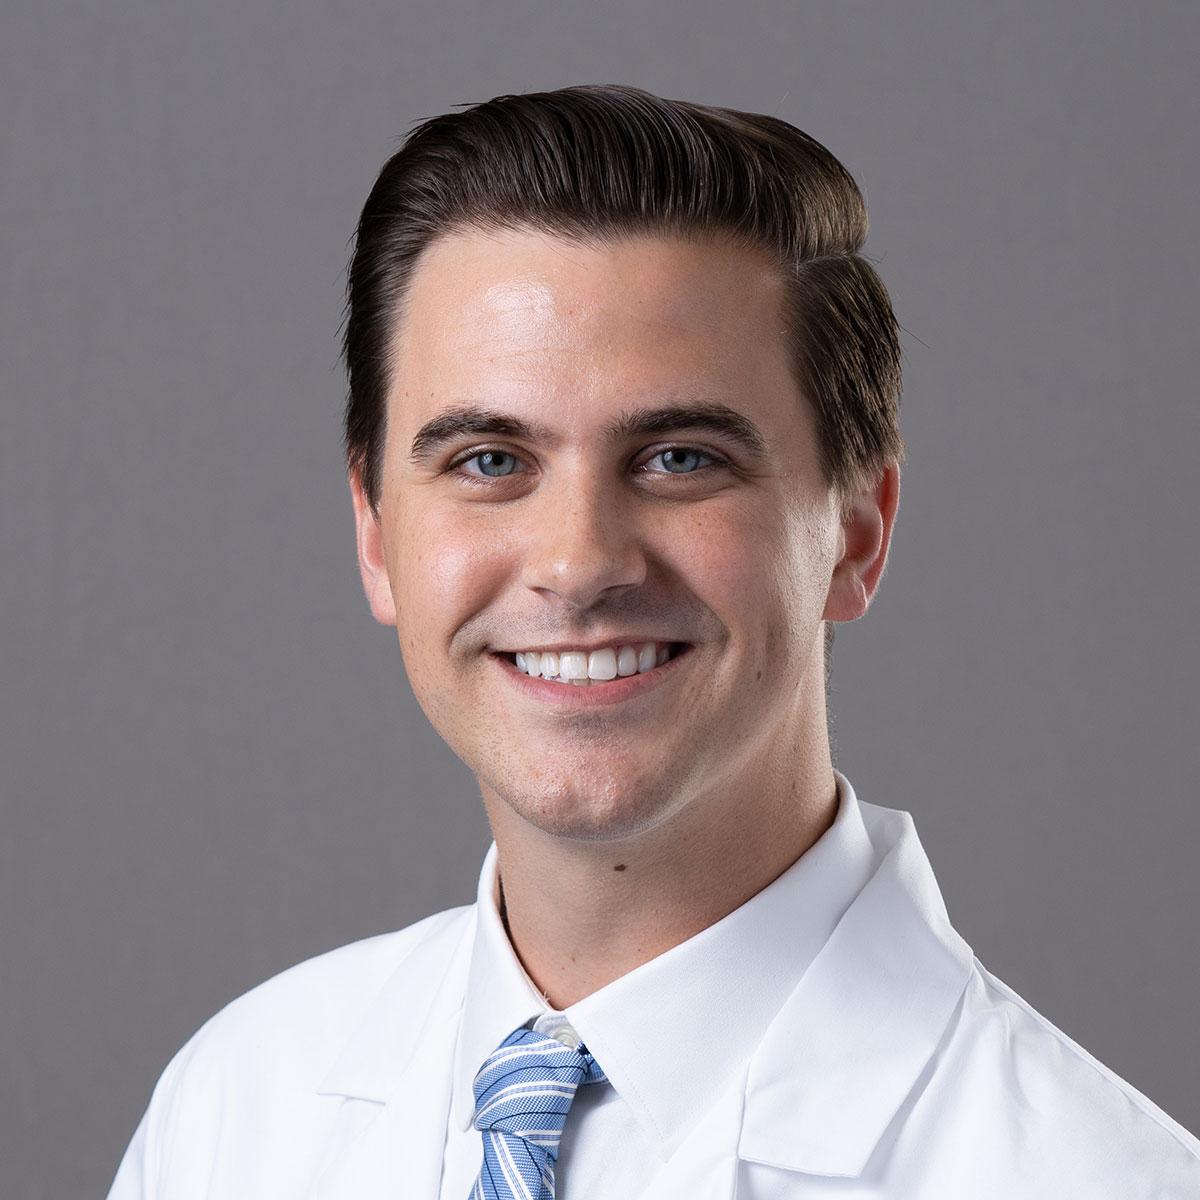 A friendly headshot of Dr. David Jones